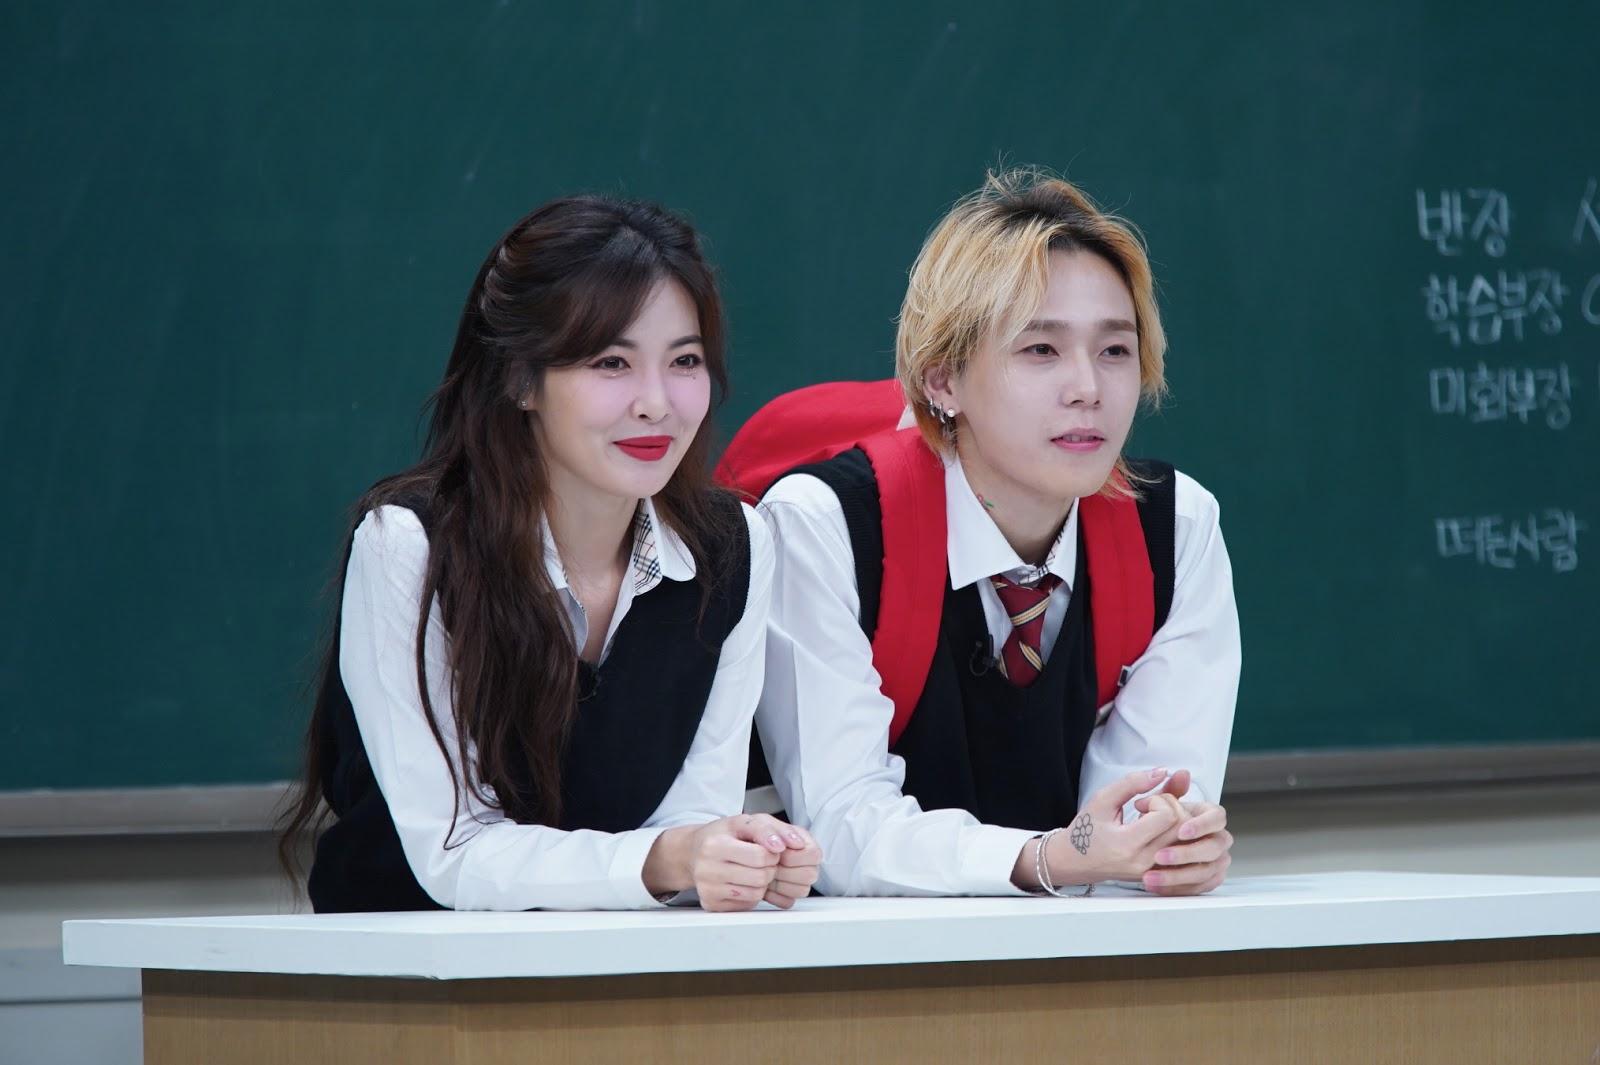 hyuna dawn main